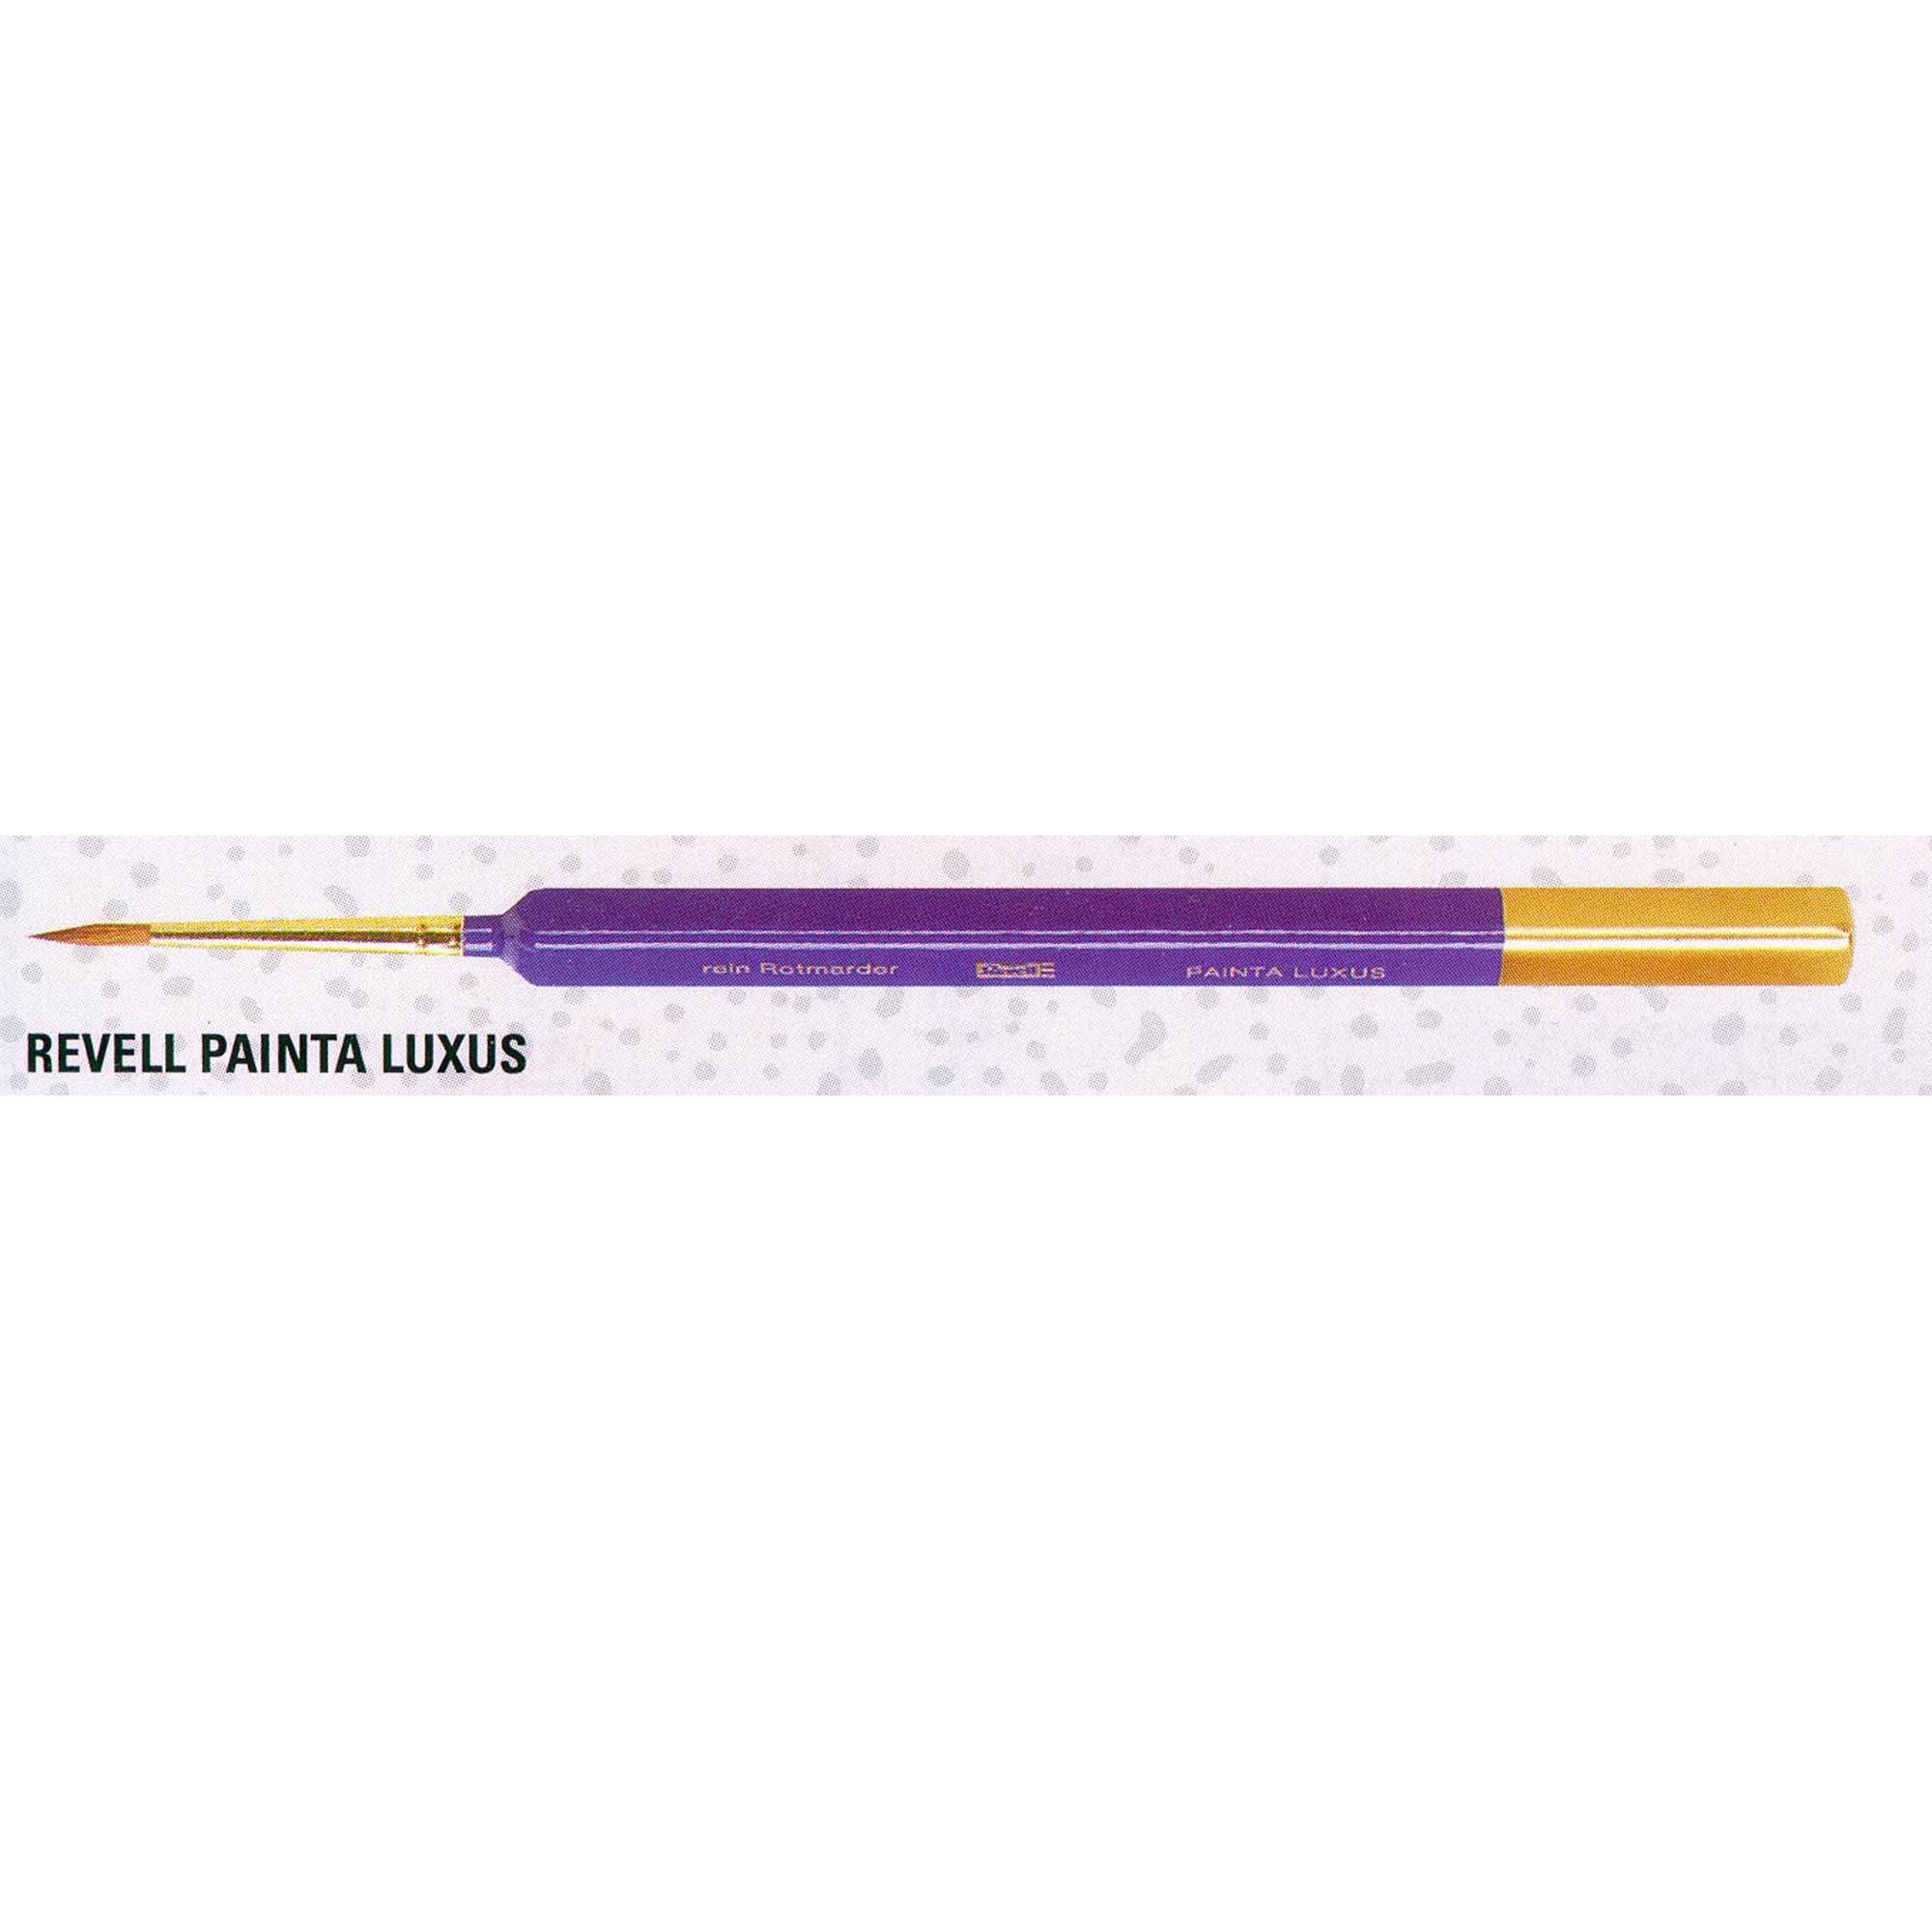 Revell pincel Painta Luxus 3/0